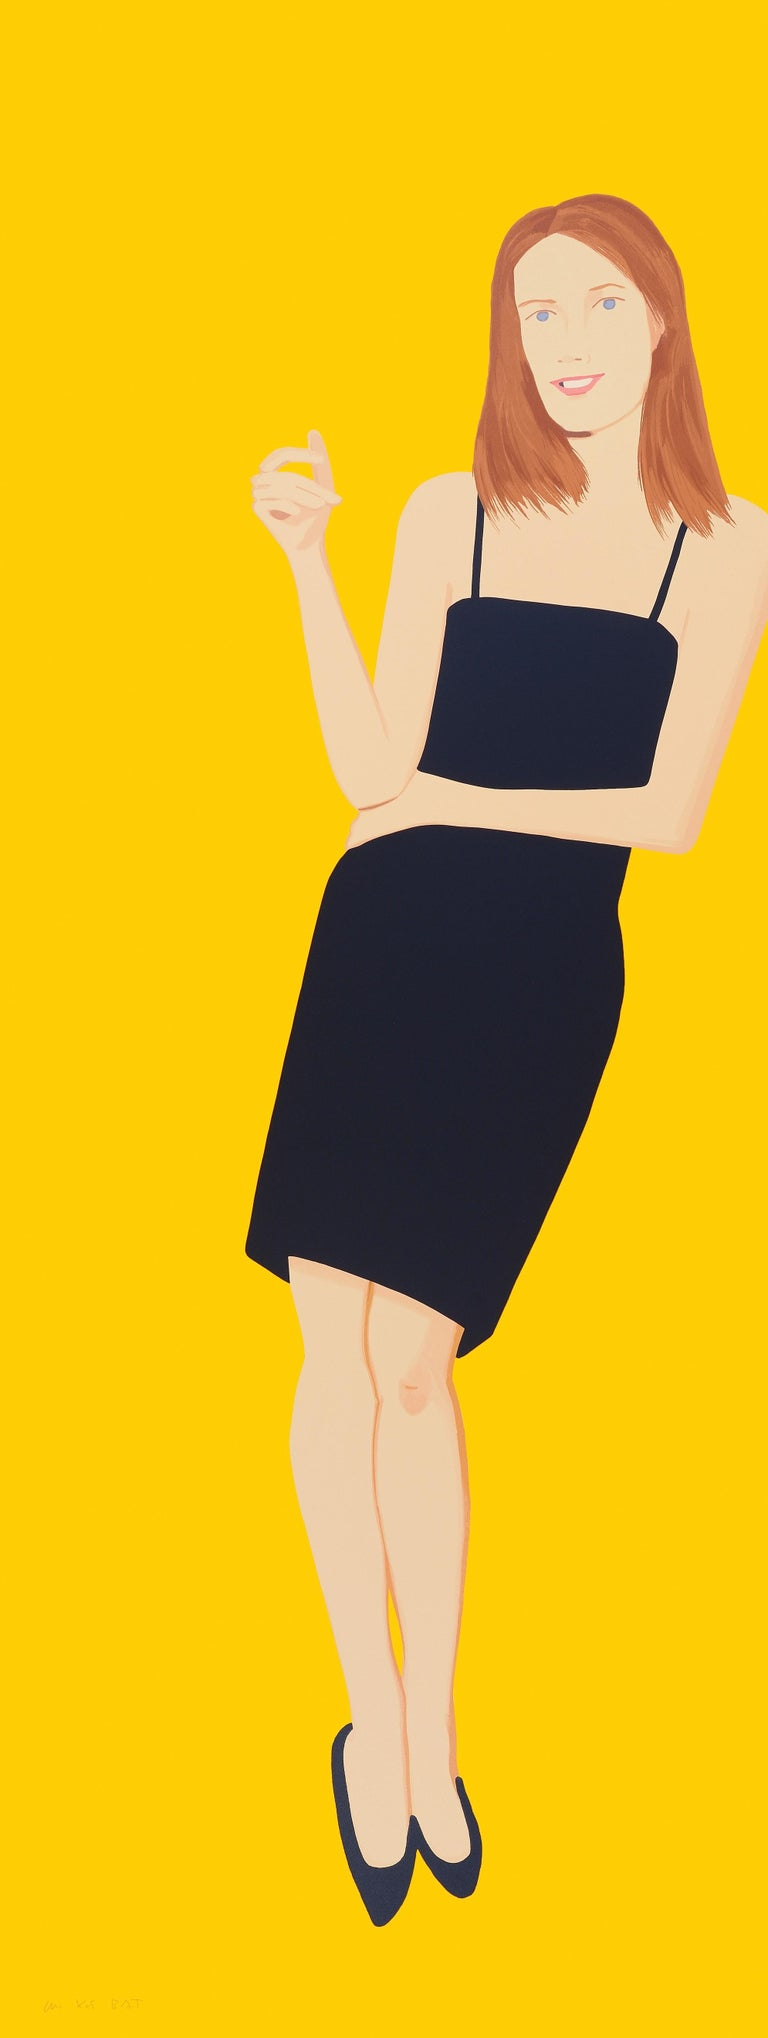 Alex Katz Portrait Print - Black Dress - Sharon